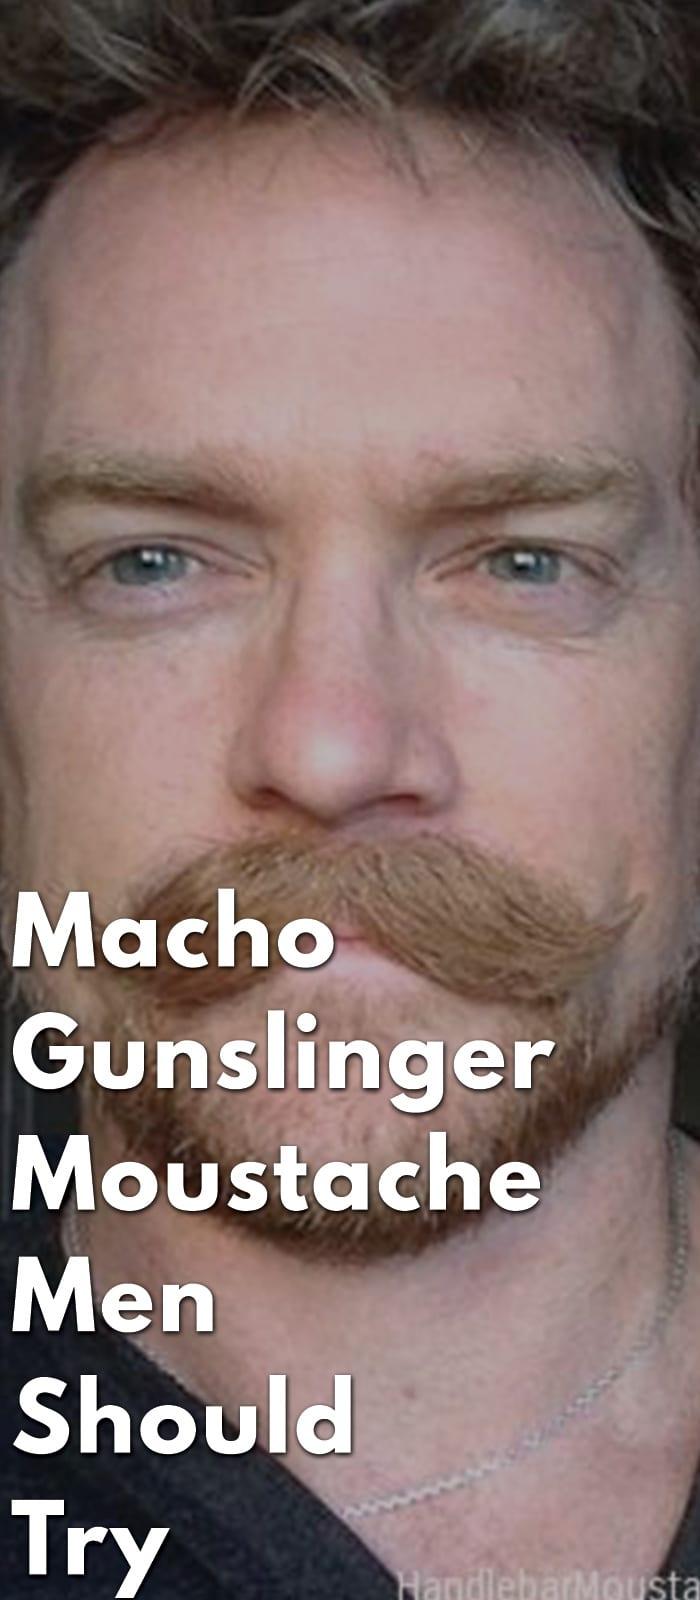 Macho-Gunslinger-Moustache-Men-Should-Try-.